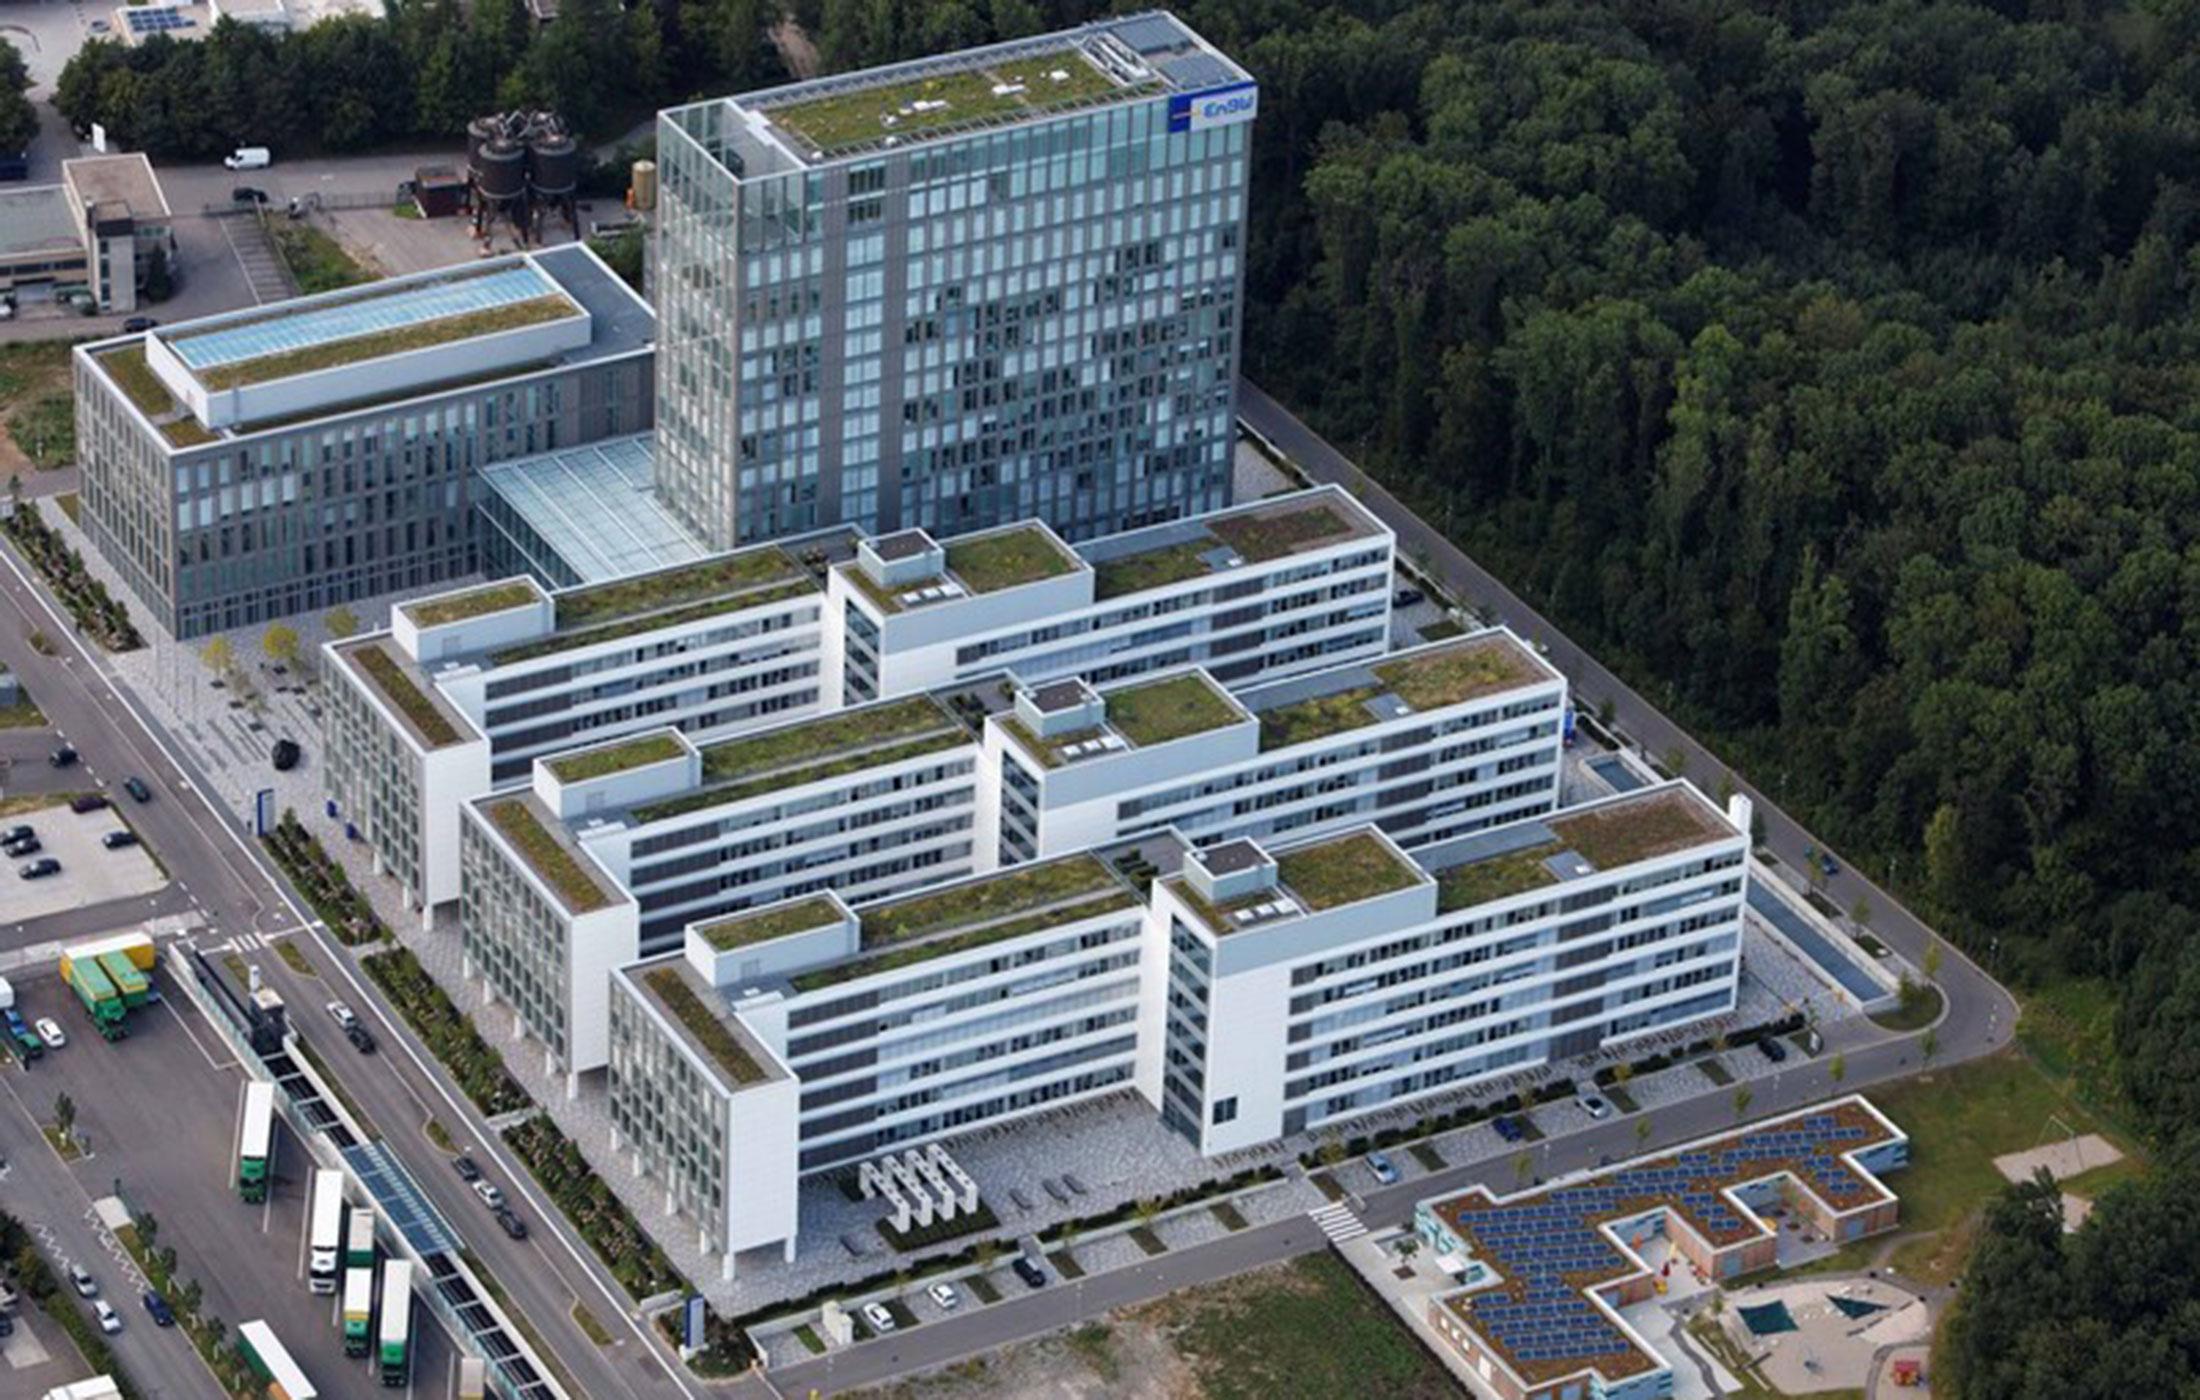 2017, Umbau EnBW Real Office, Karlsruhe und Stuttgart